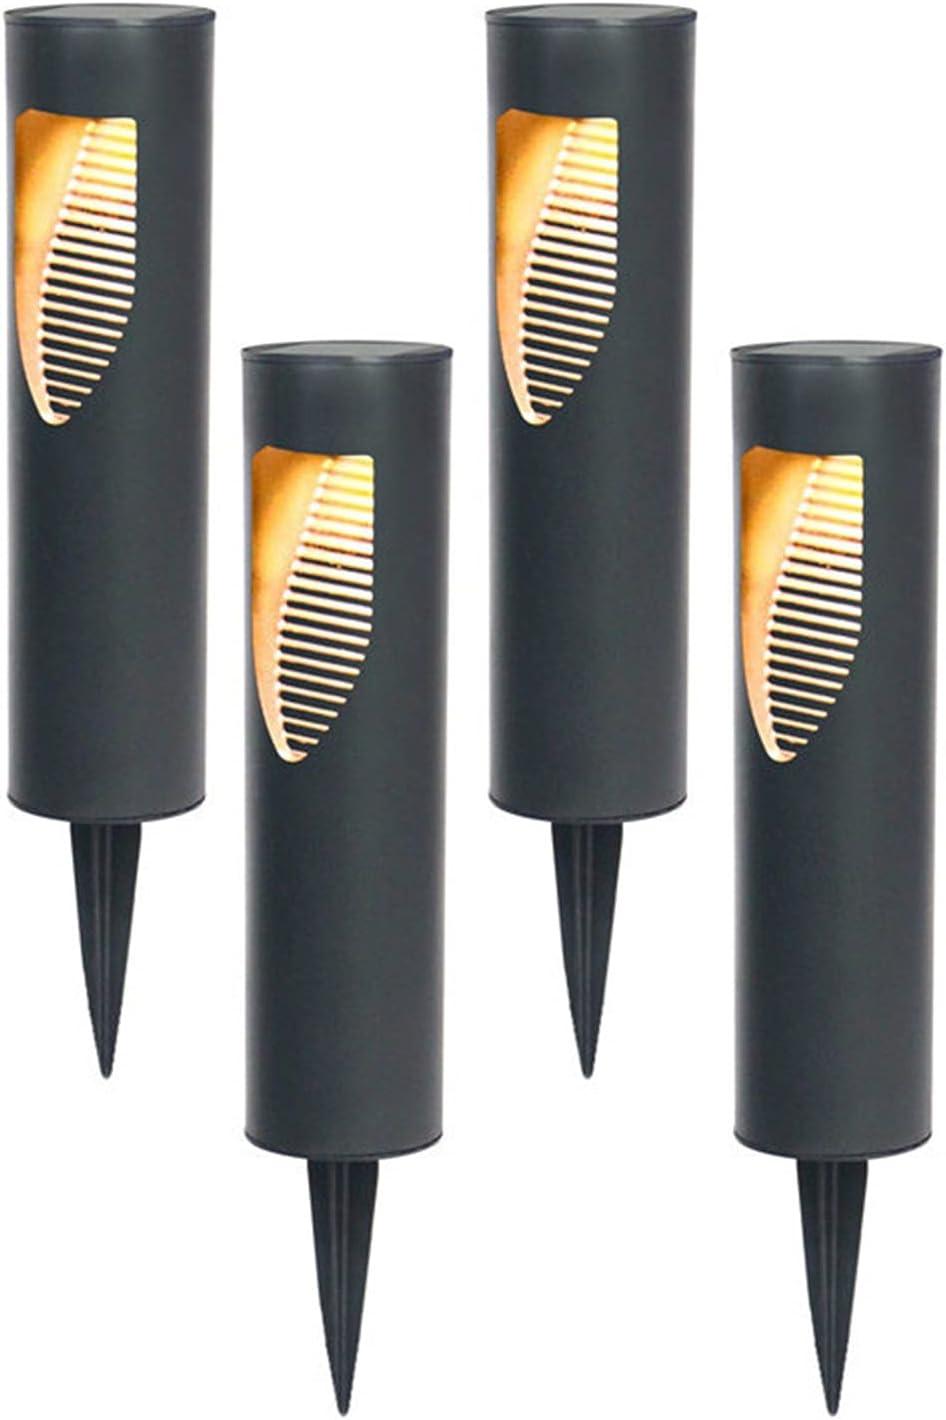 WENMENG2021 Motion Sensor gift Soldering Lights Outdoor Lamp Lawn Garden Solar